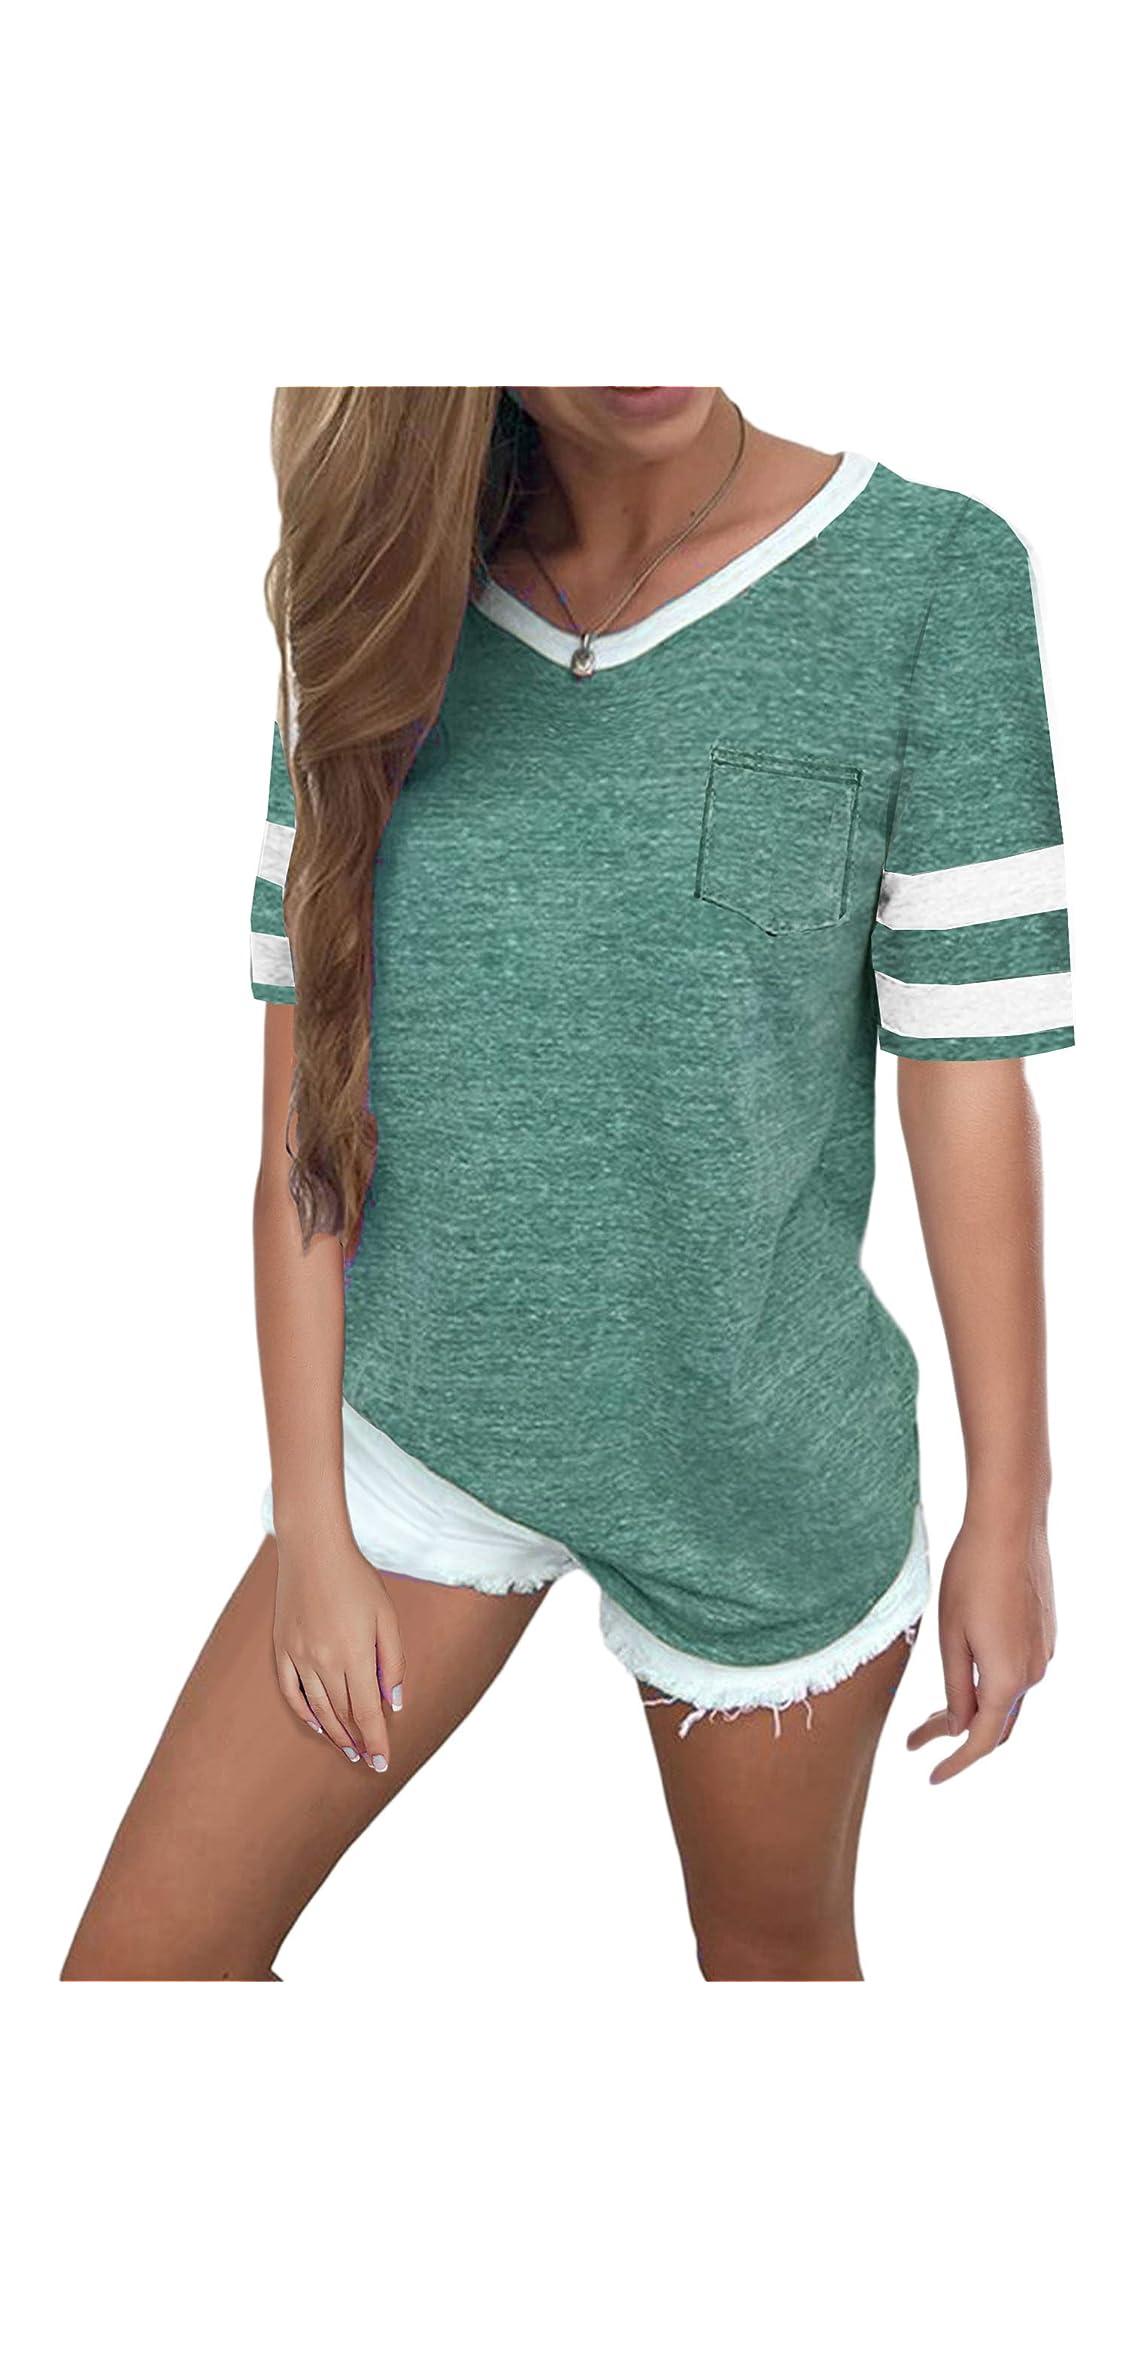 Women's Tops Casual Cotton V Neck Sport T Shirt Sleeve